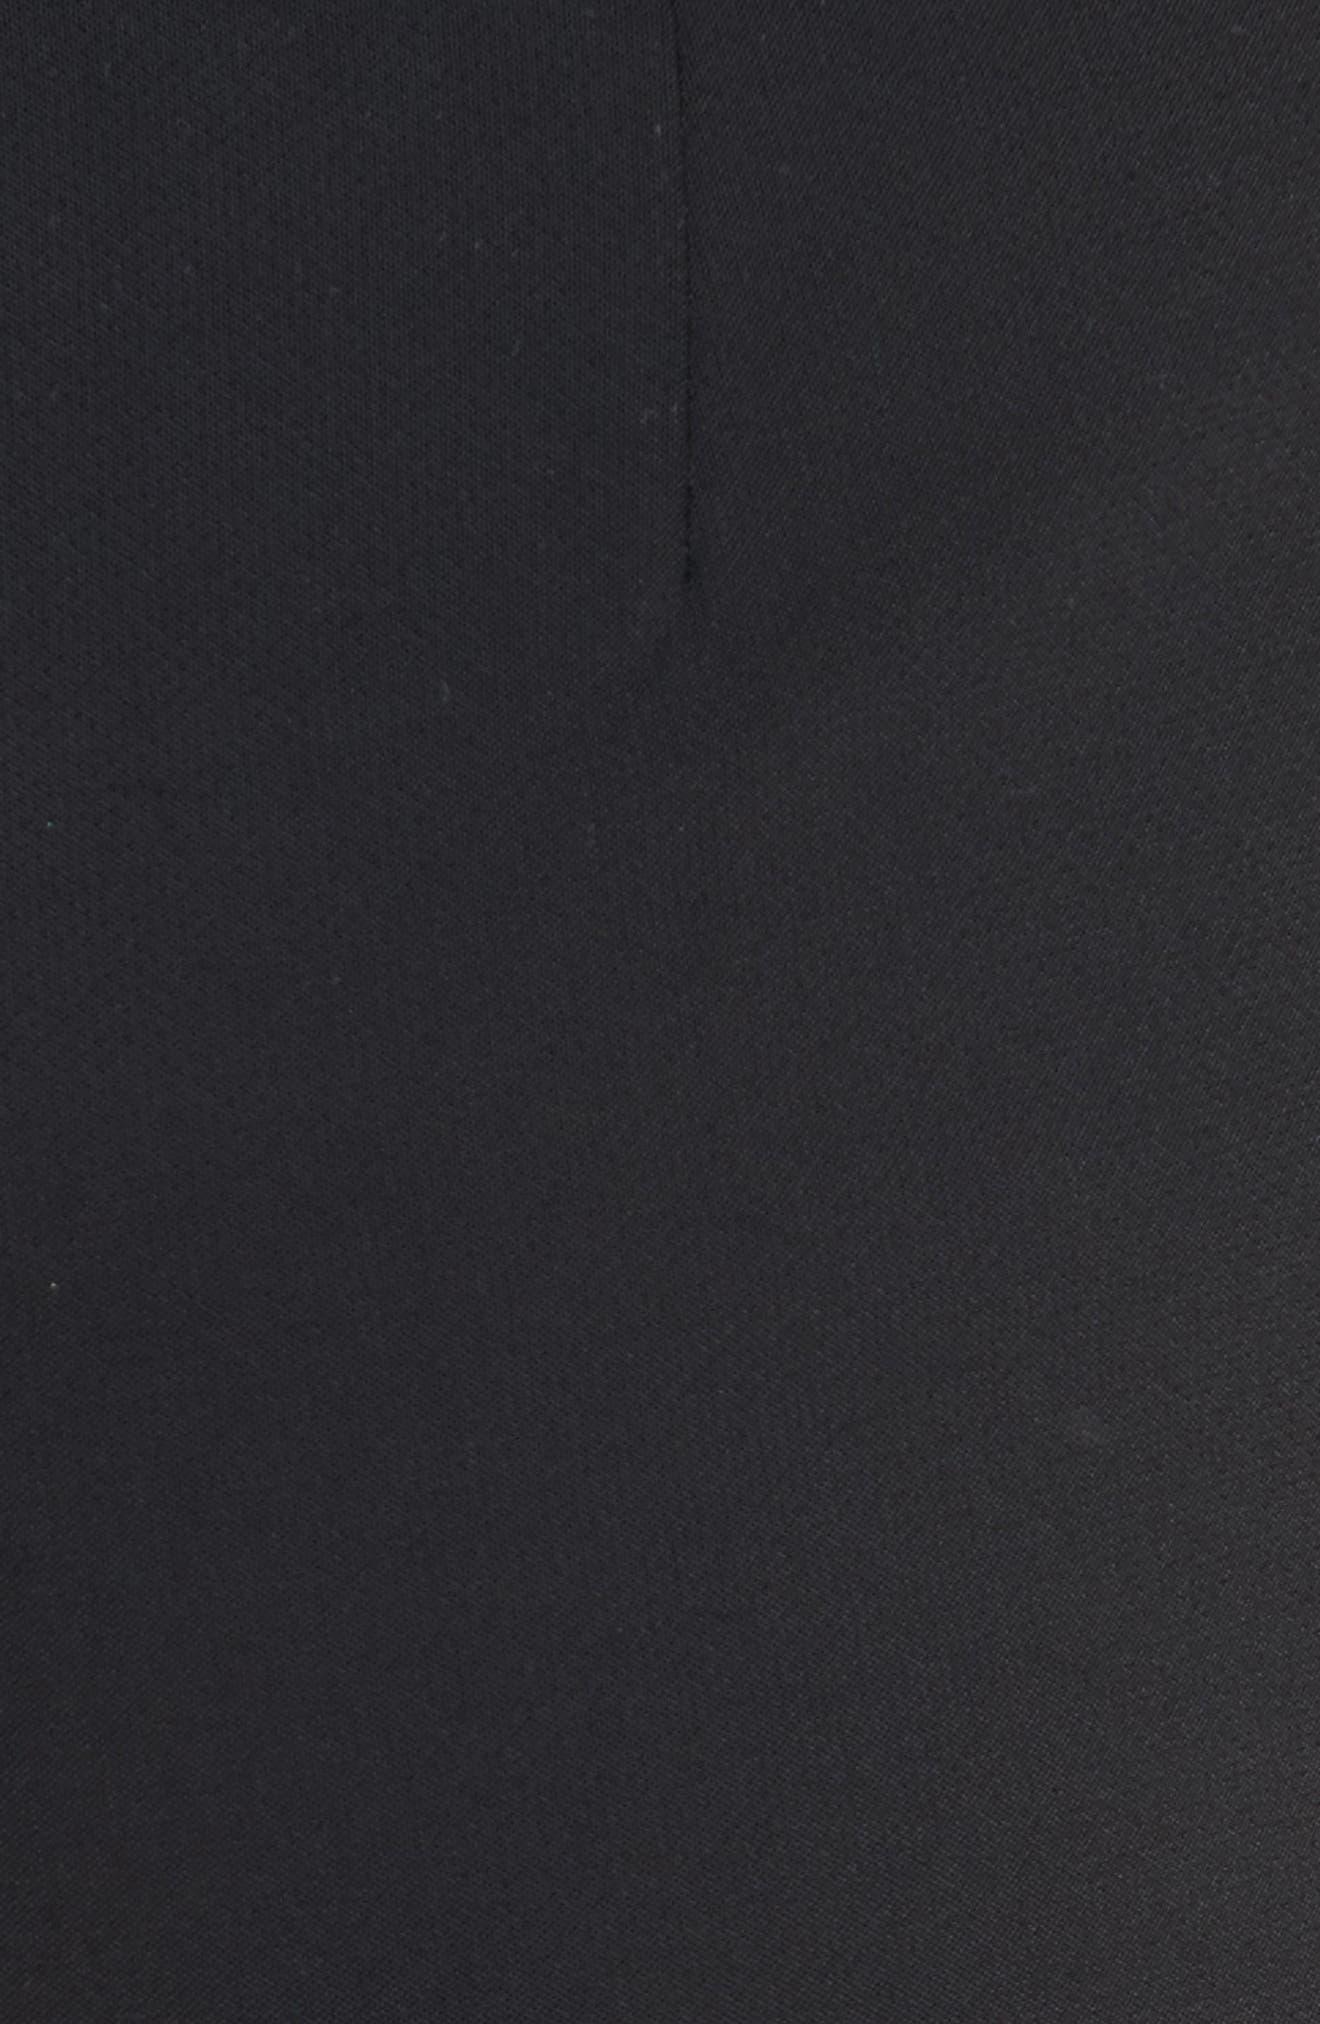 William Ruffle Hem Pants,                             Alternate thumbnail 5, color,                             001